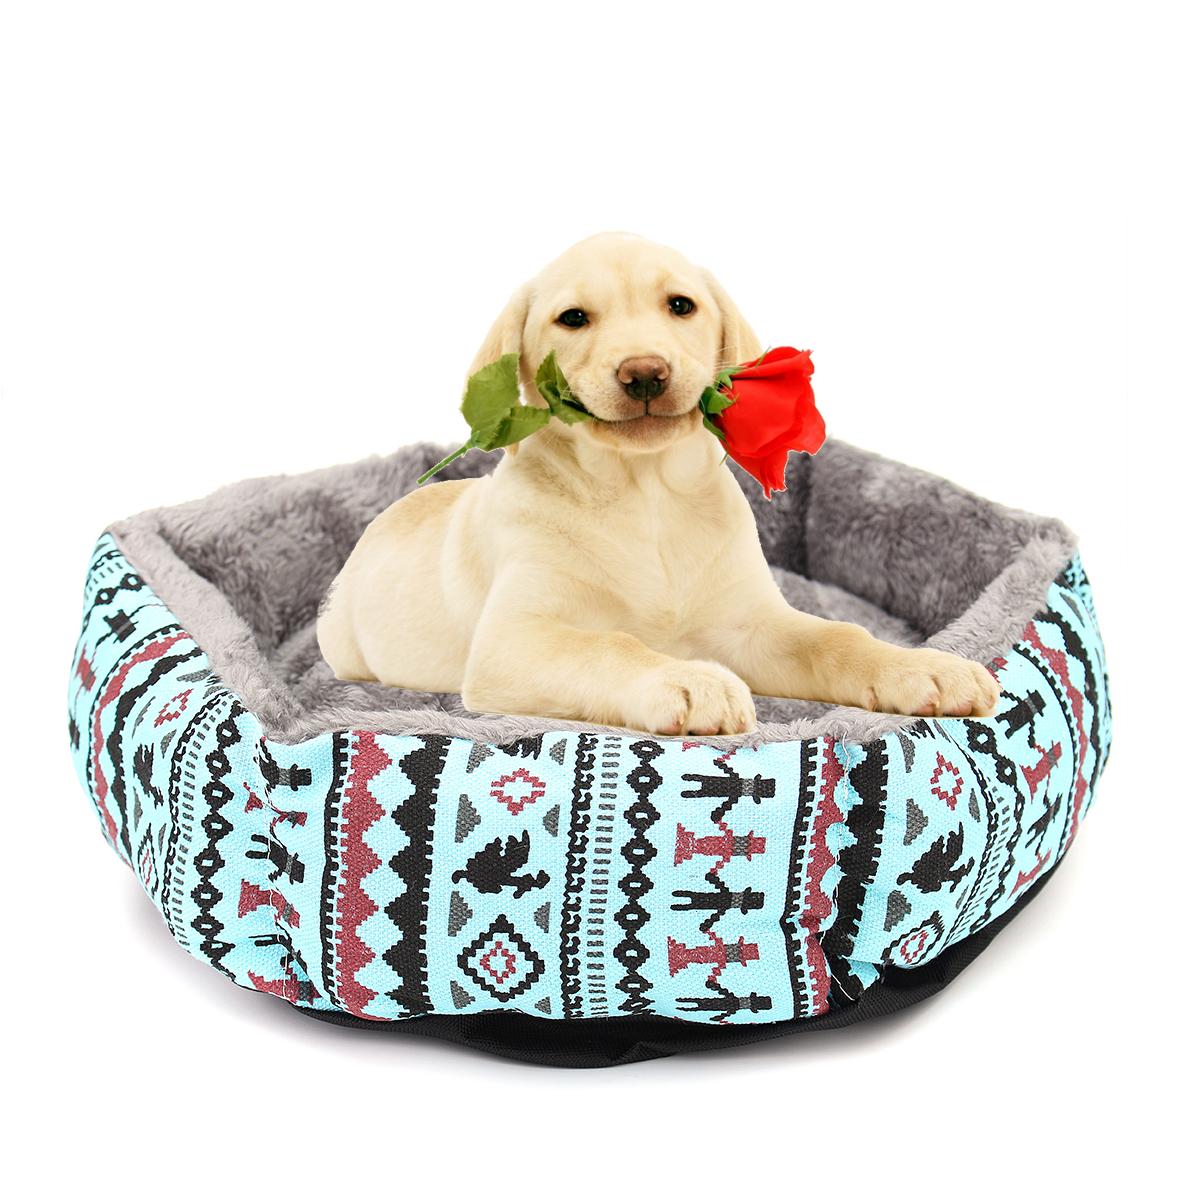 40cm Pet Dog Puppy Cat Kitten Bed Soft Cushion Warm Kennel Mat Pad Blanket